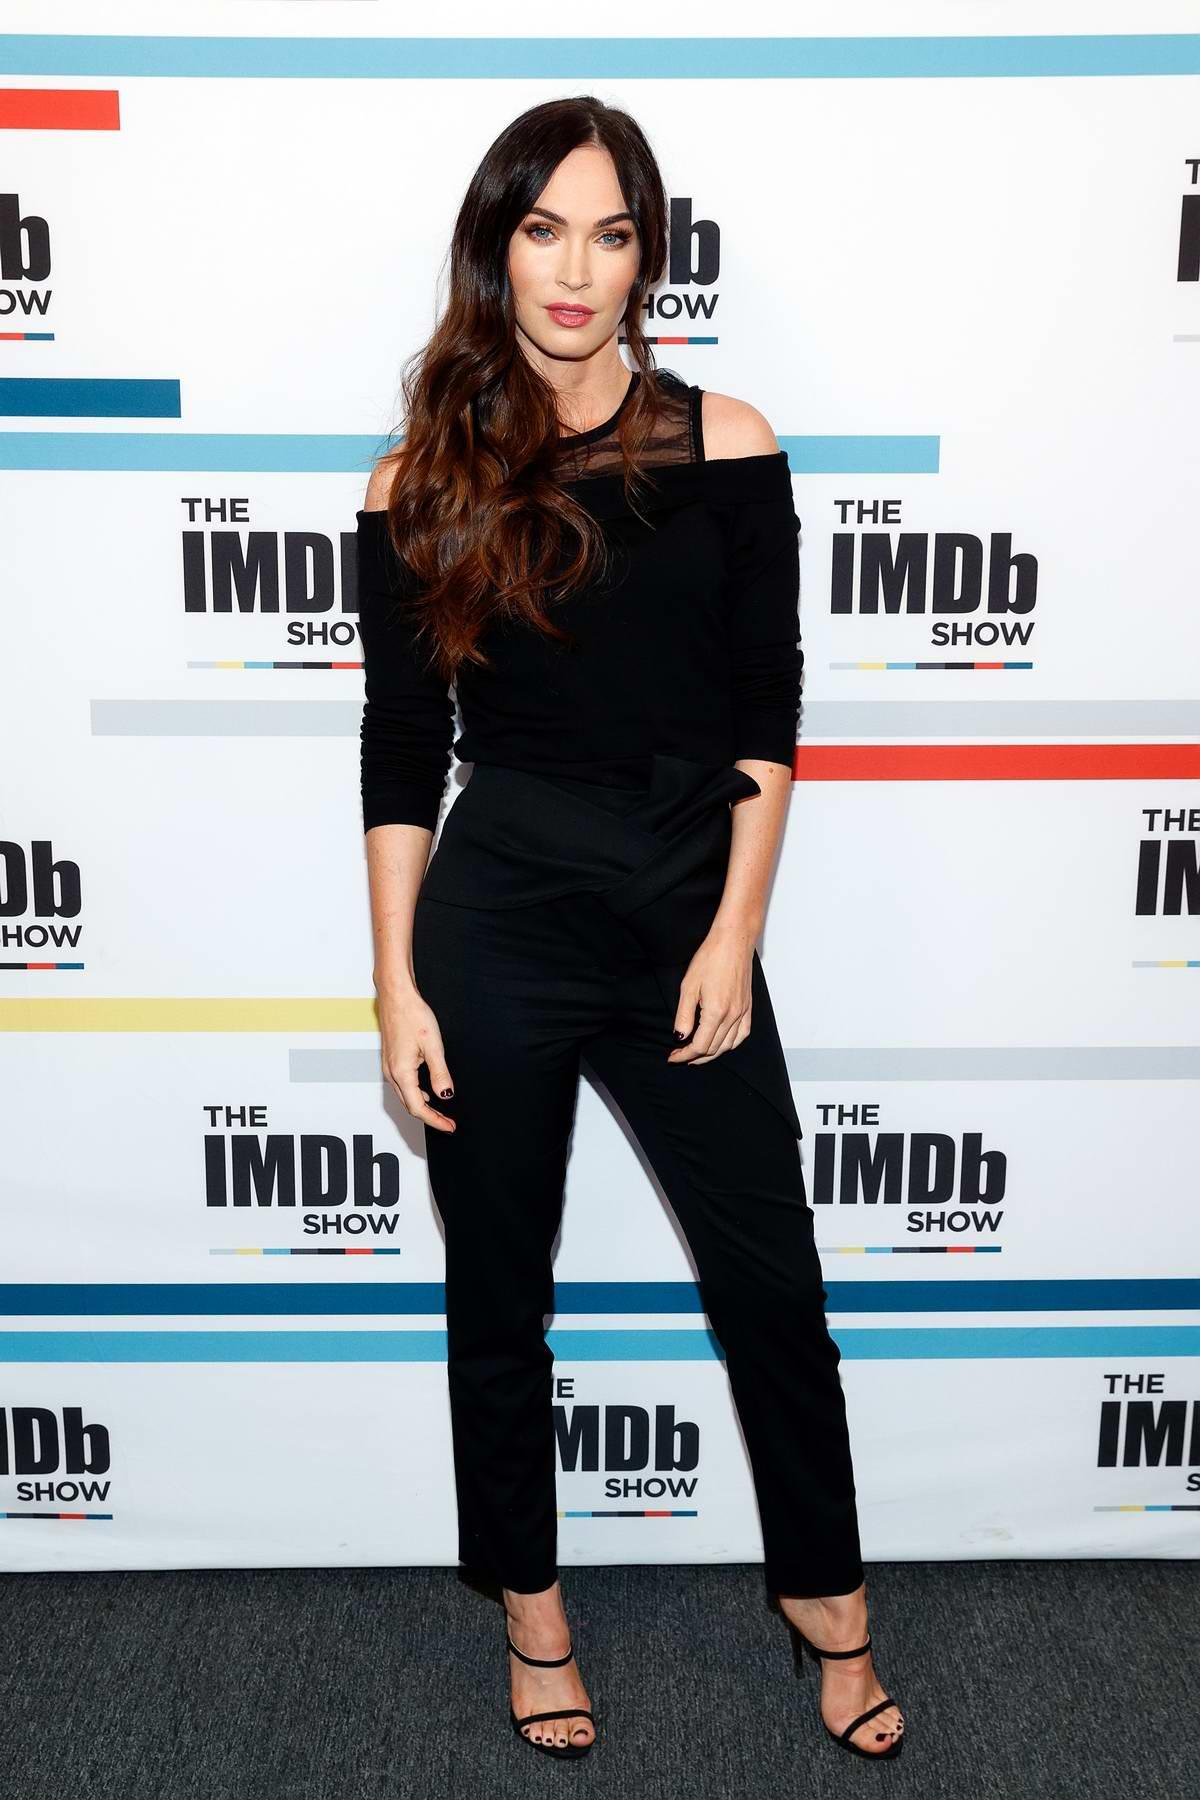 Megan Fox visits 'The IMDB Show' in Studio City, Los Angeles